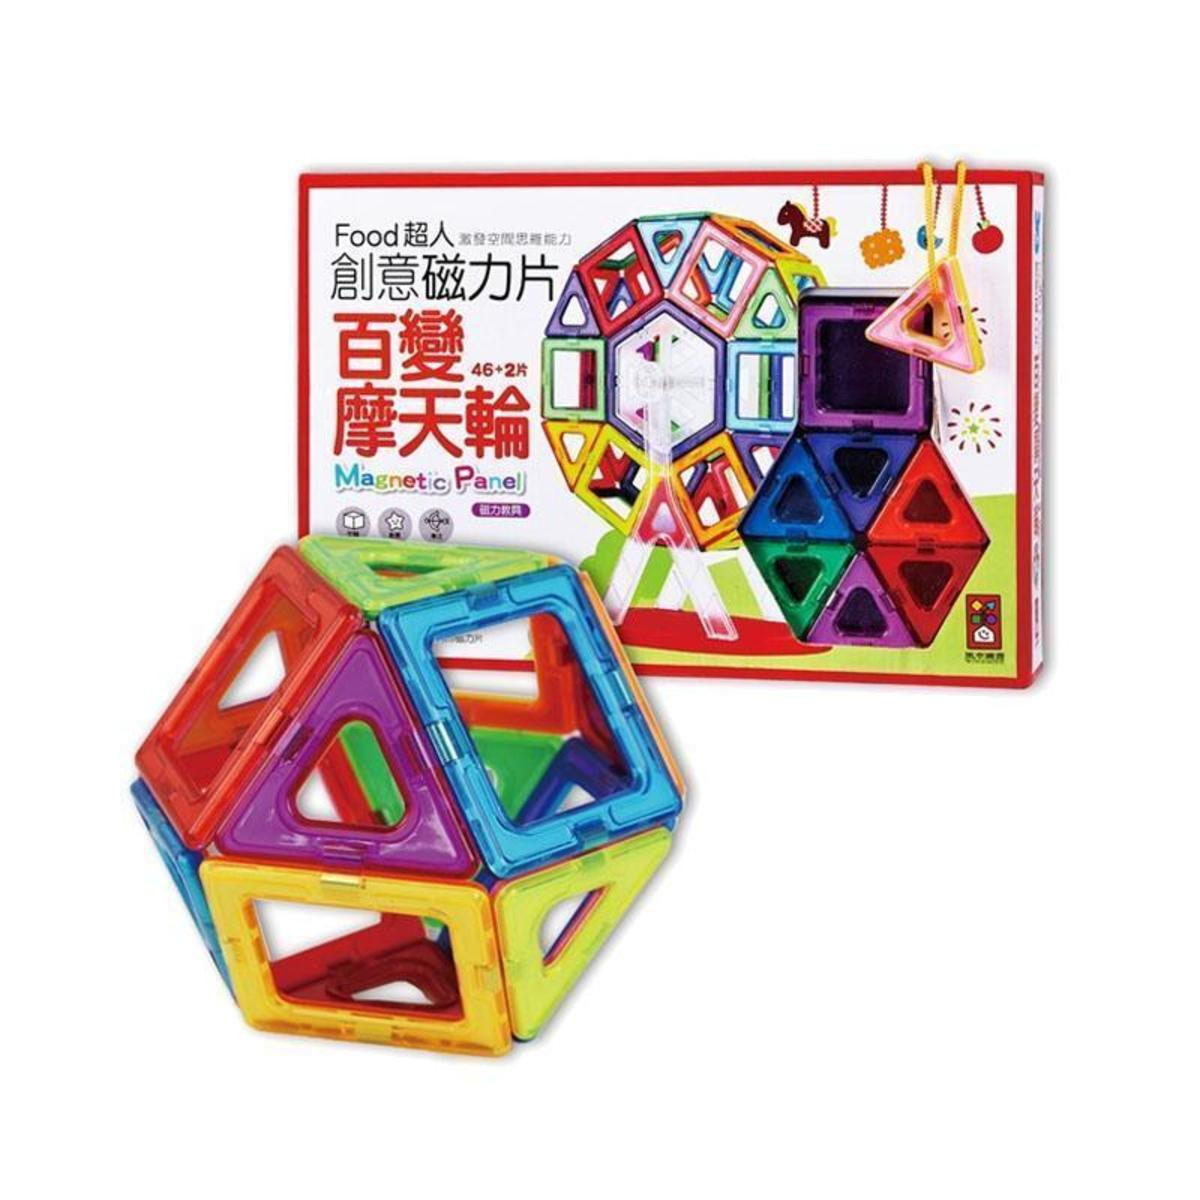 Publishing Food Superman Creative Magnetic Piece - Variety Ferris Wheel Taiwan Import